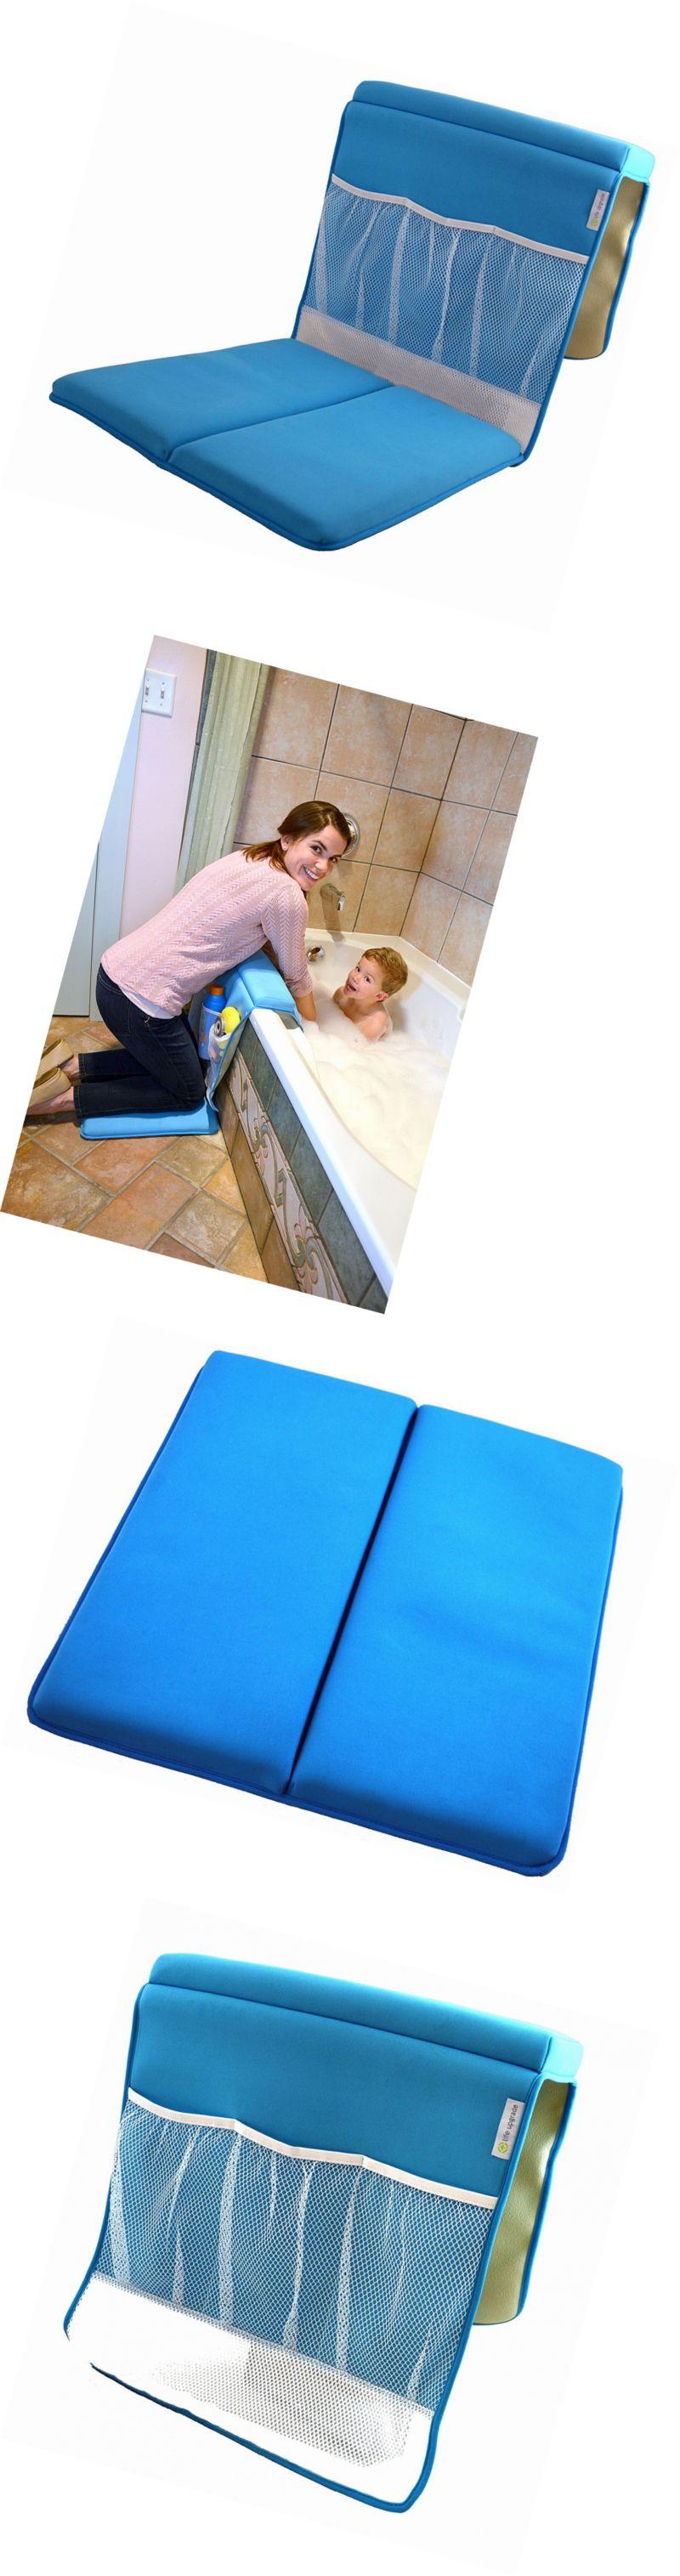 Bathing Accessories 100221: Life Upgrade Bath Kneeler In Blue ...